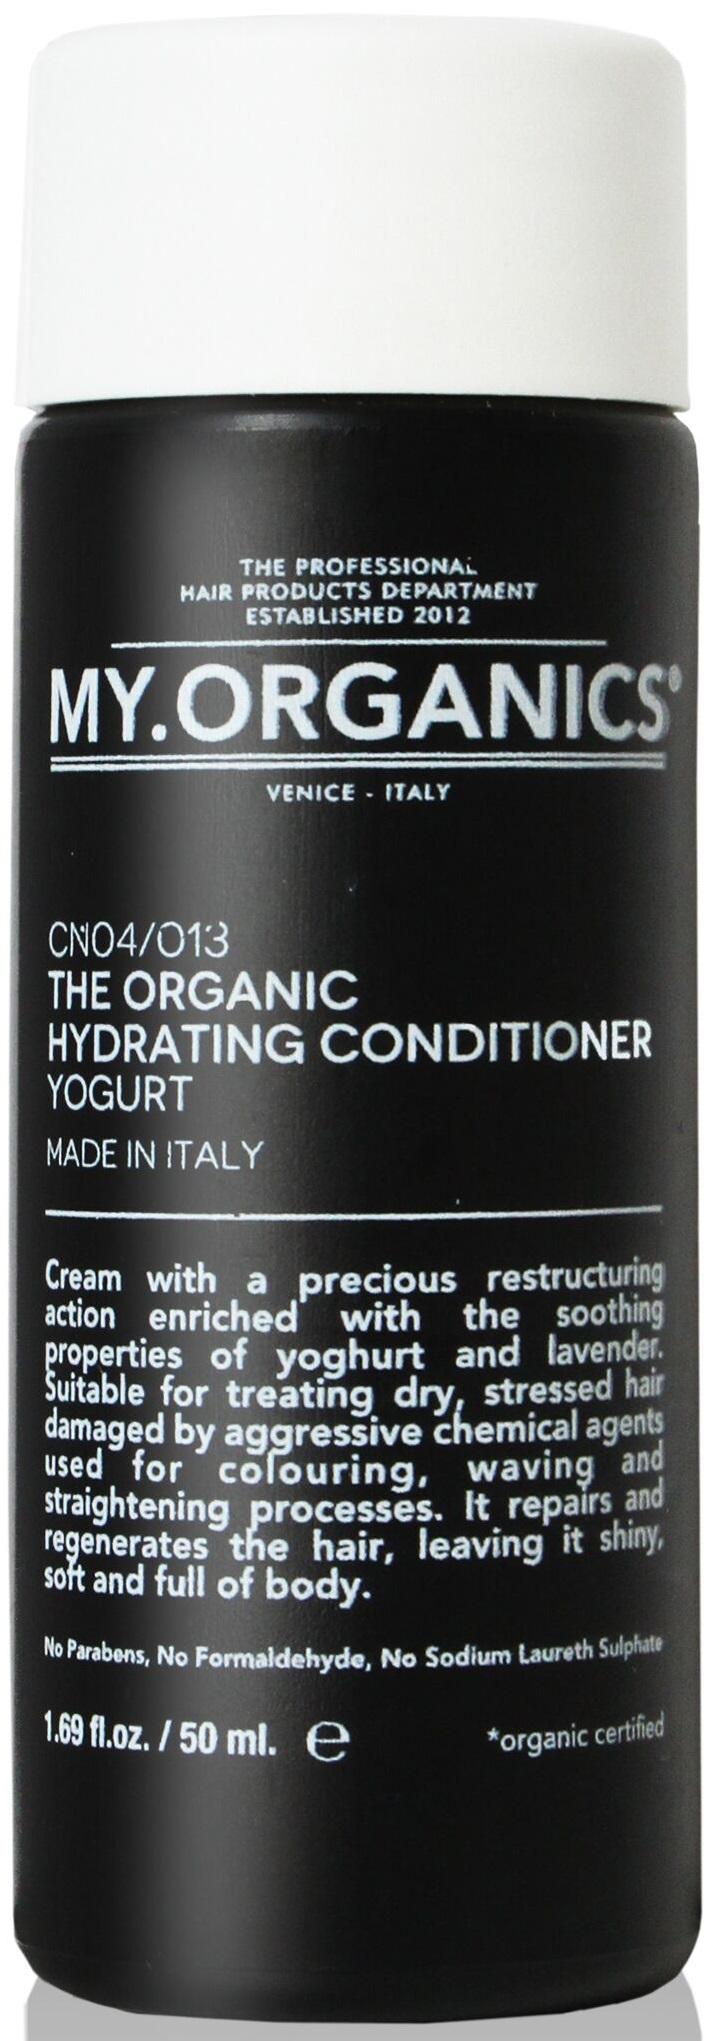 MY.ORGANICS The Organic Hydrating Conditioner Yogurt 50ml